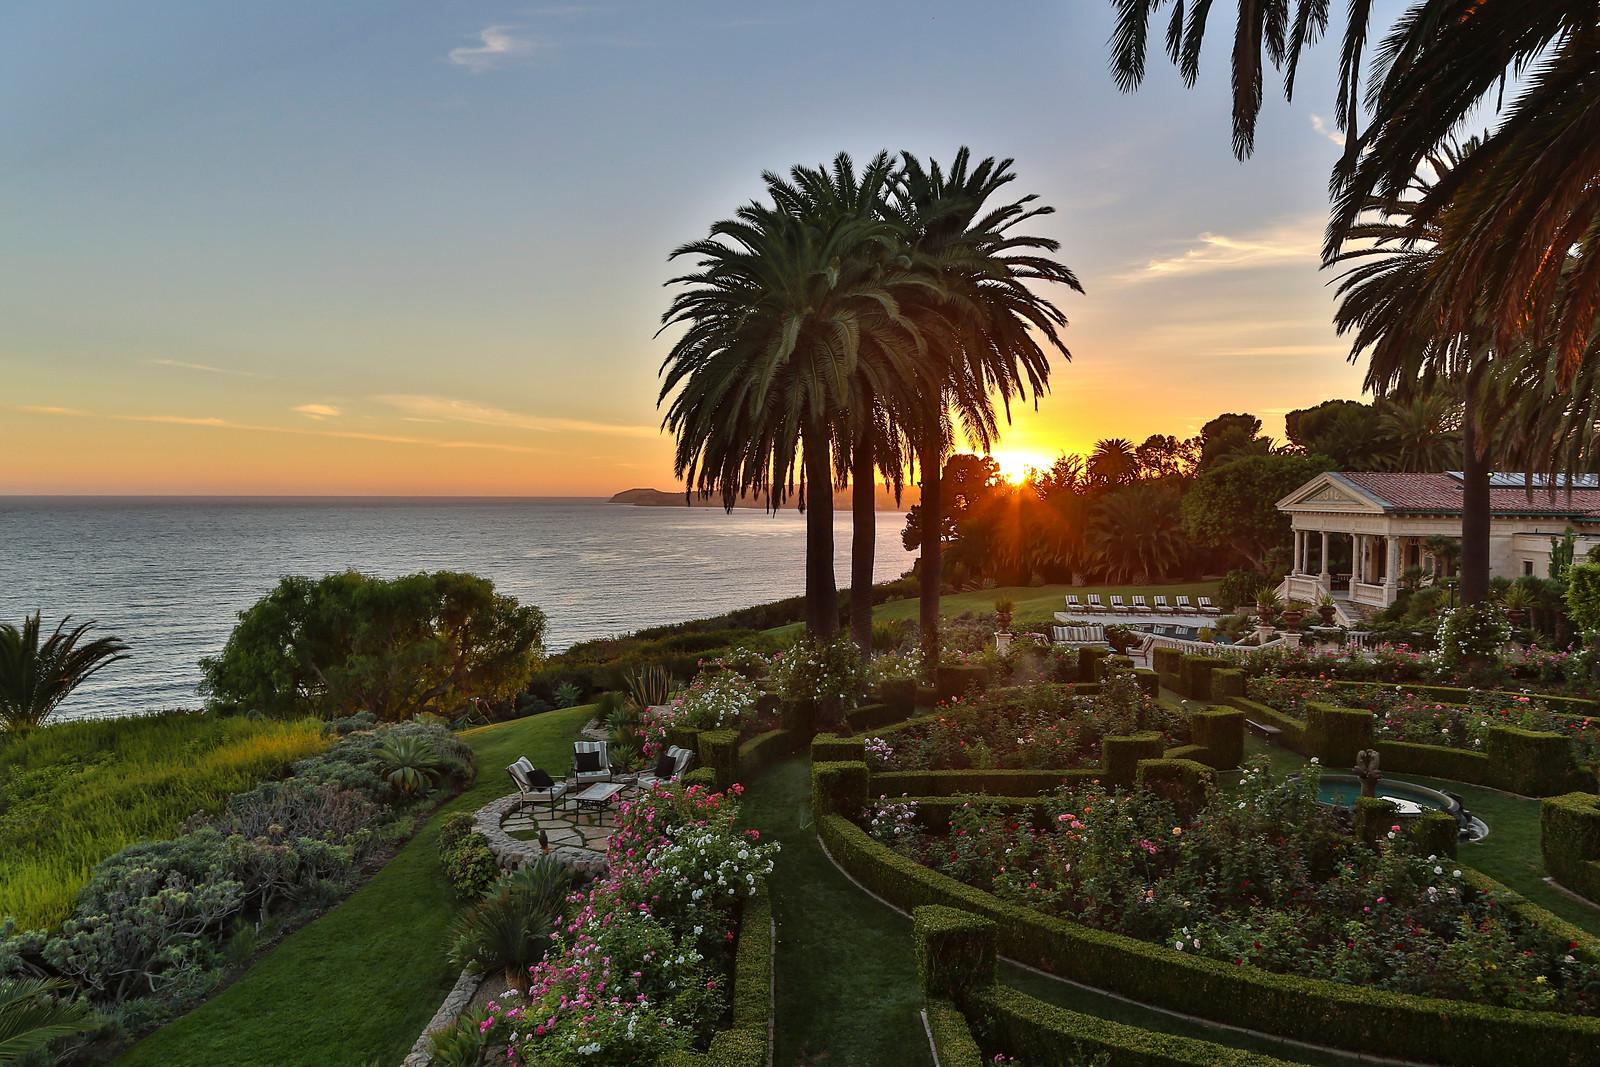 La Villa Contenta - $60 Million - LuxuryHomes.com - Living